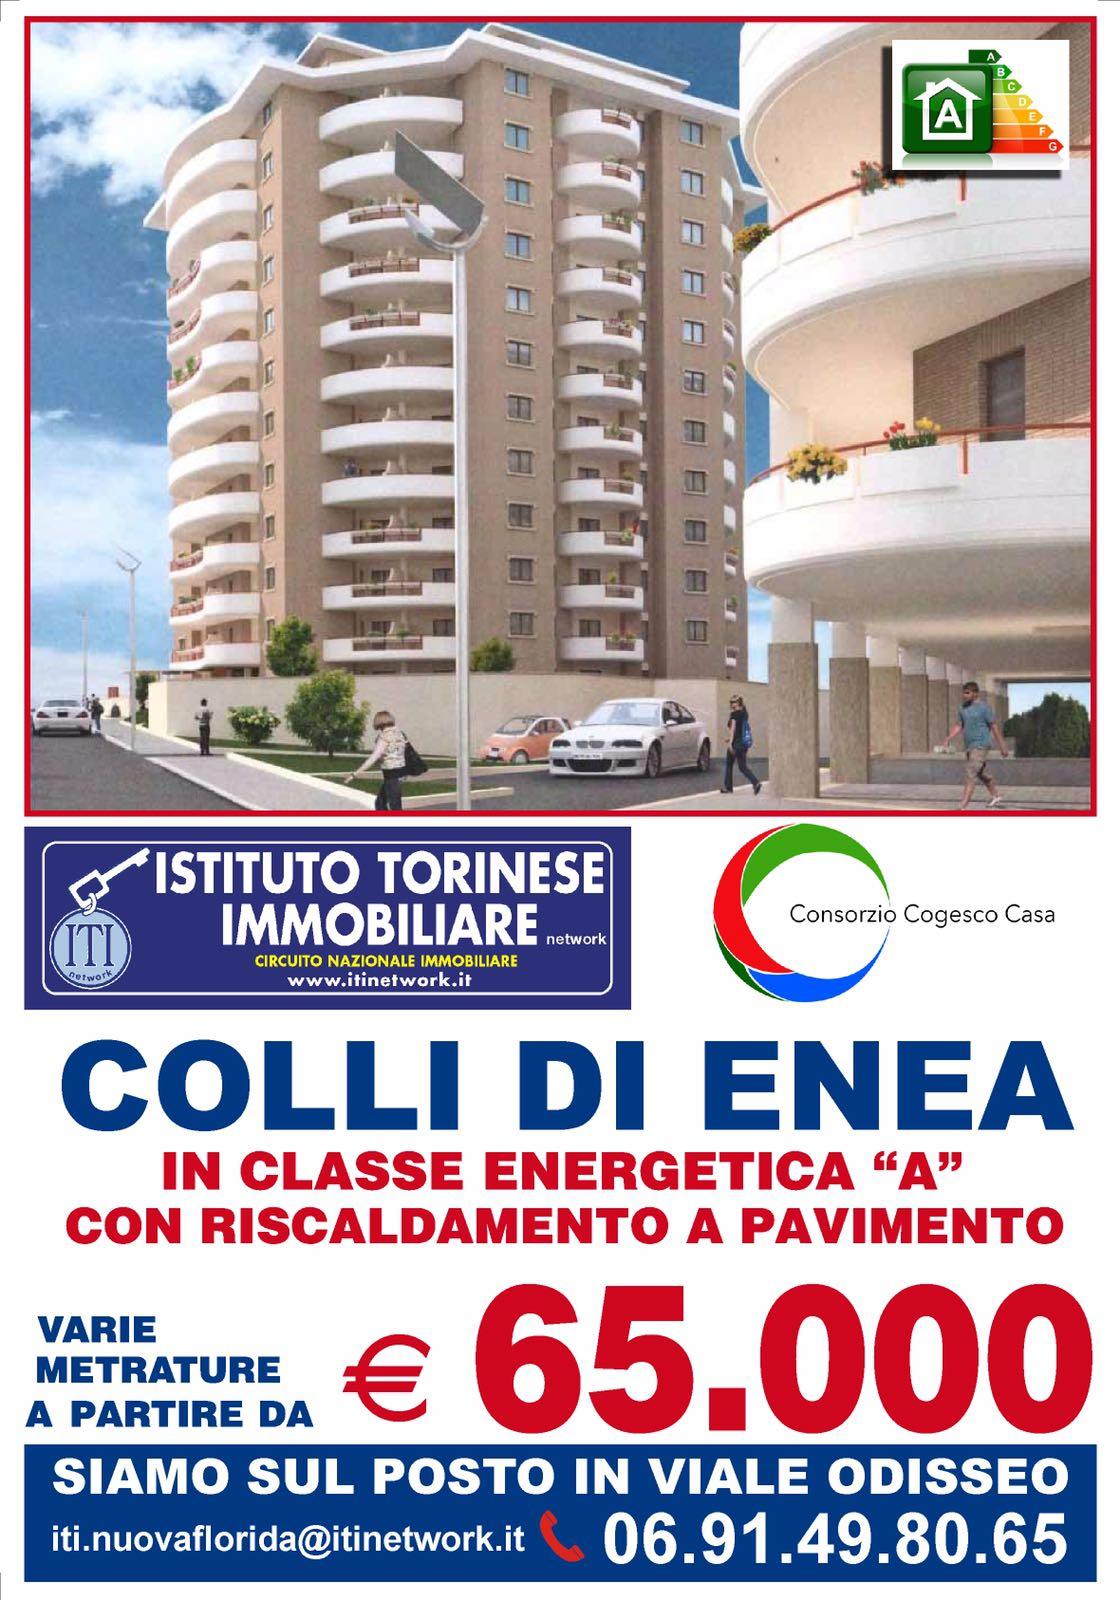 pomezia vendita quart: pomezia centro istituto torinese immobiliare